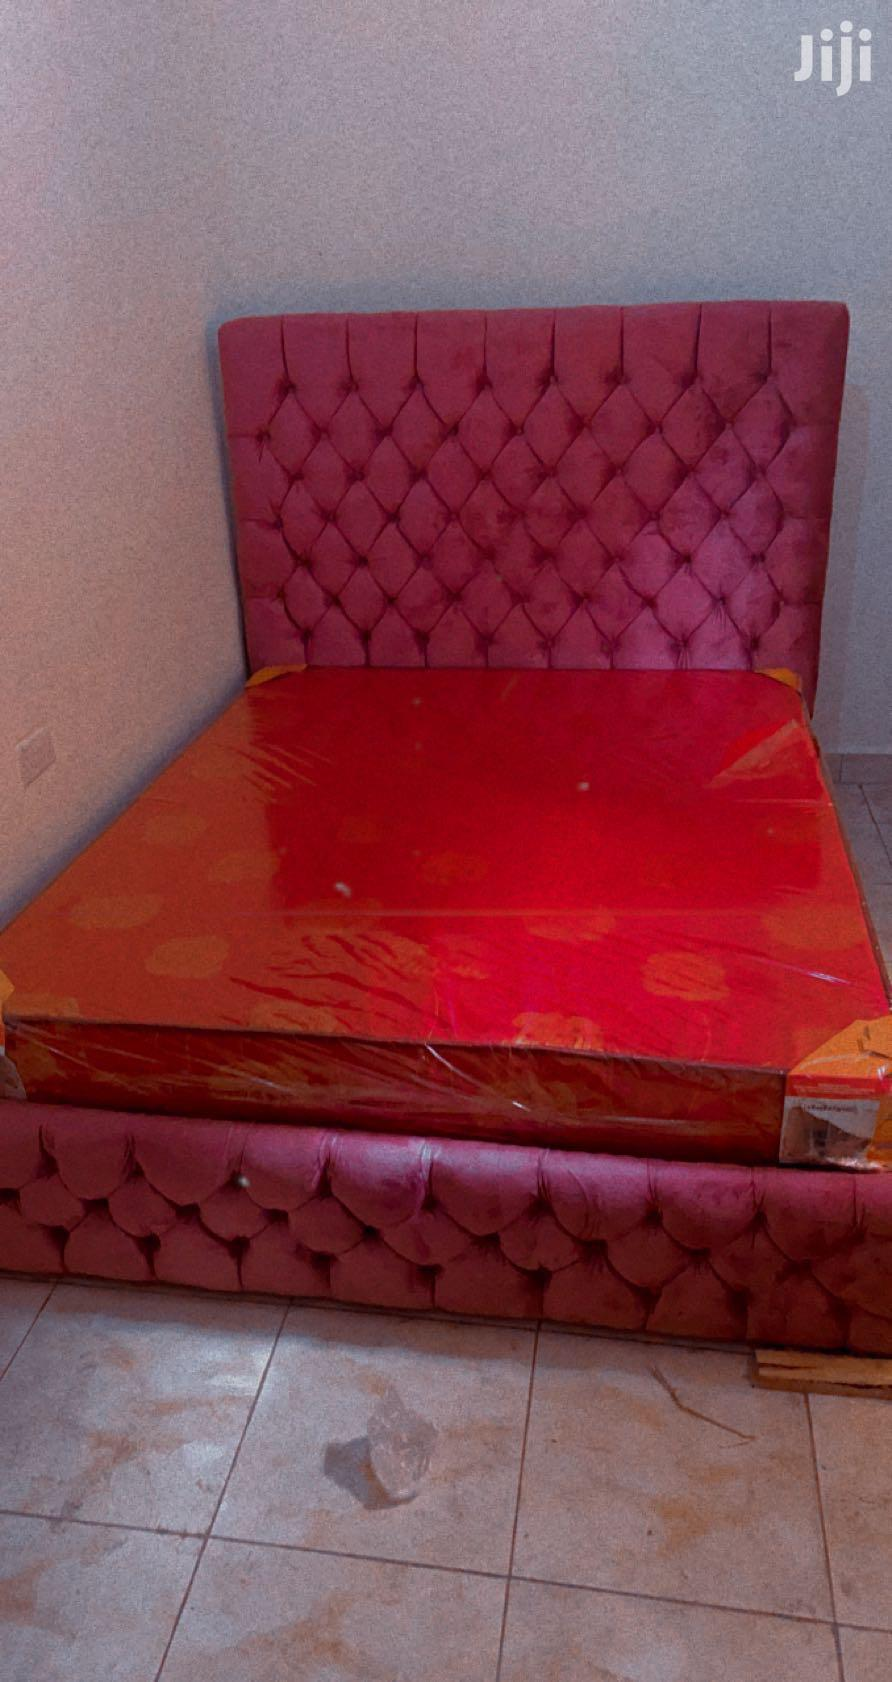 Archive Pink Headboard 5by6 Bed In Kampala Furniture Sharif Papa Jiji Ug